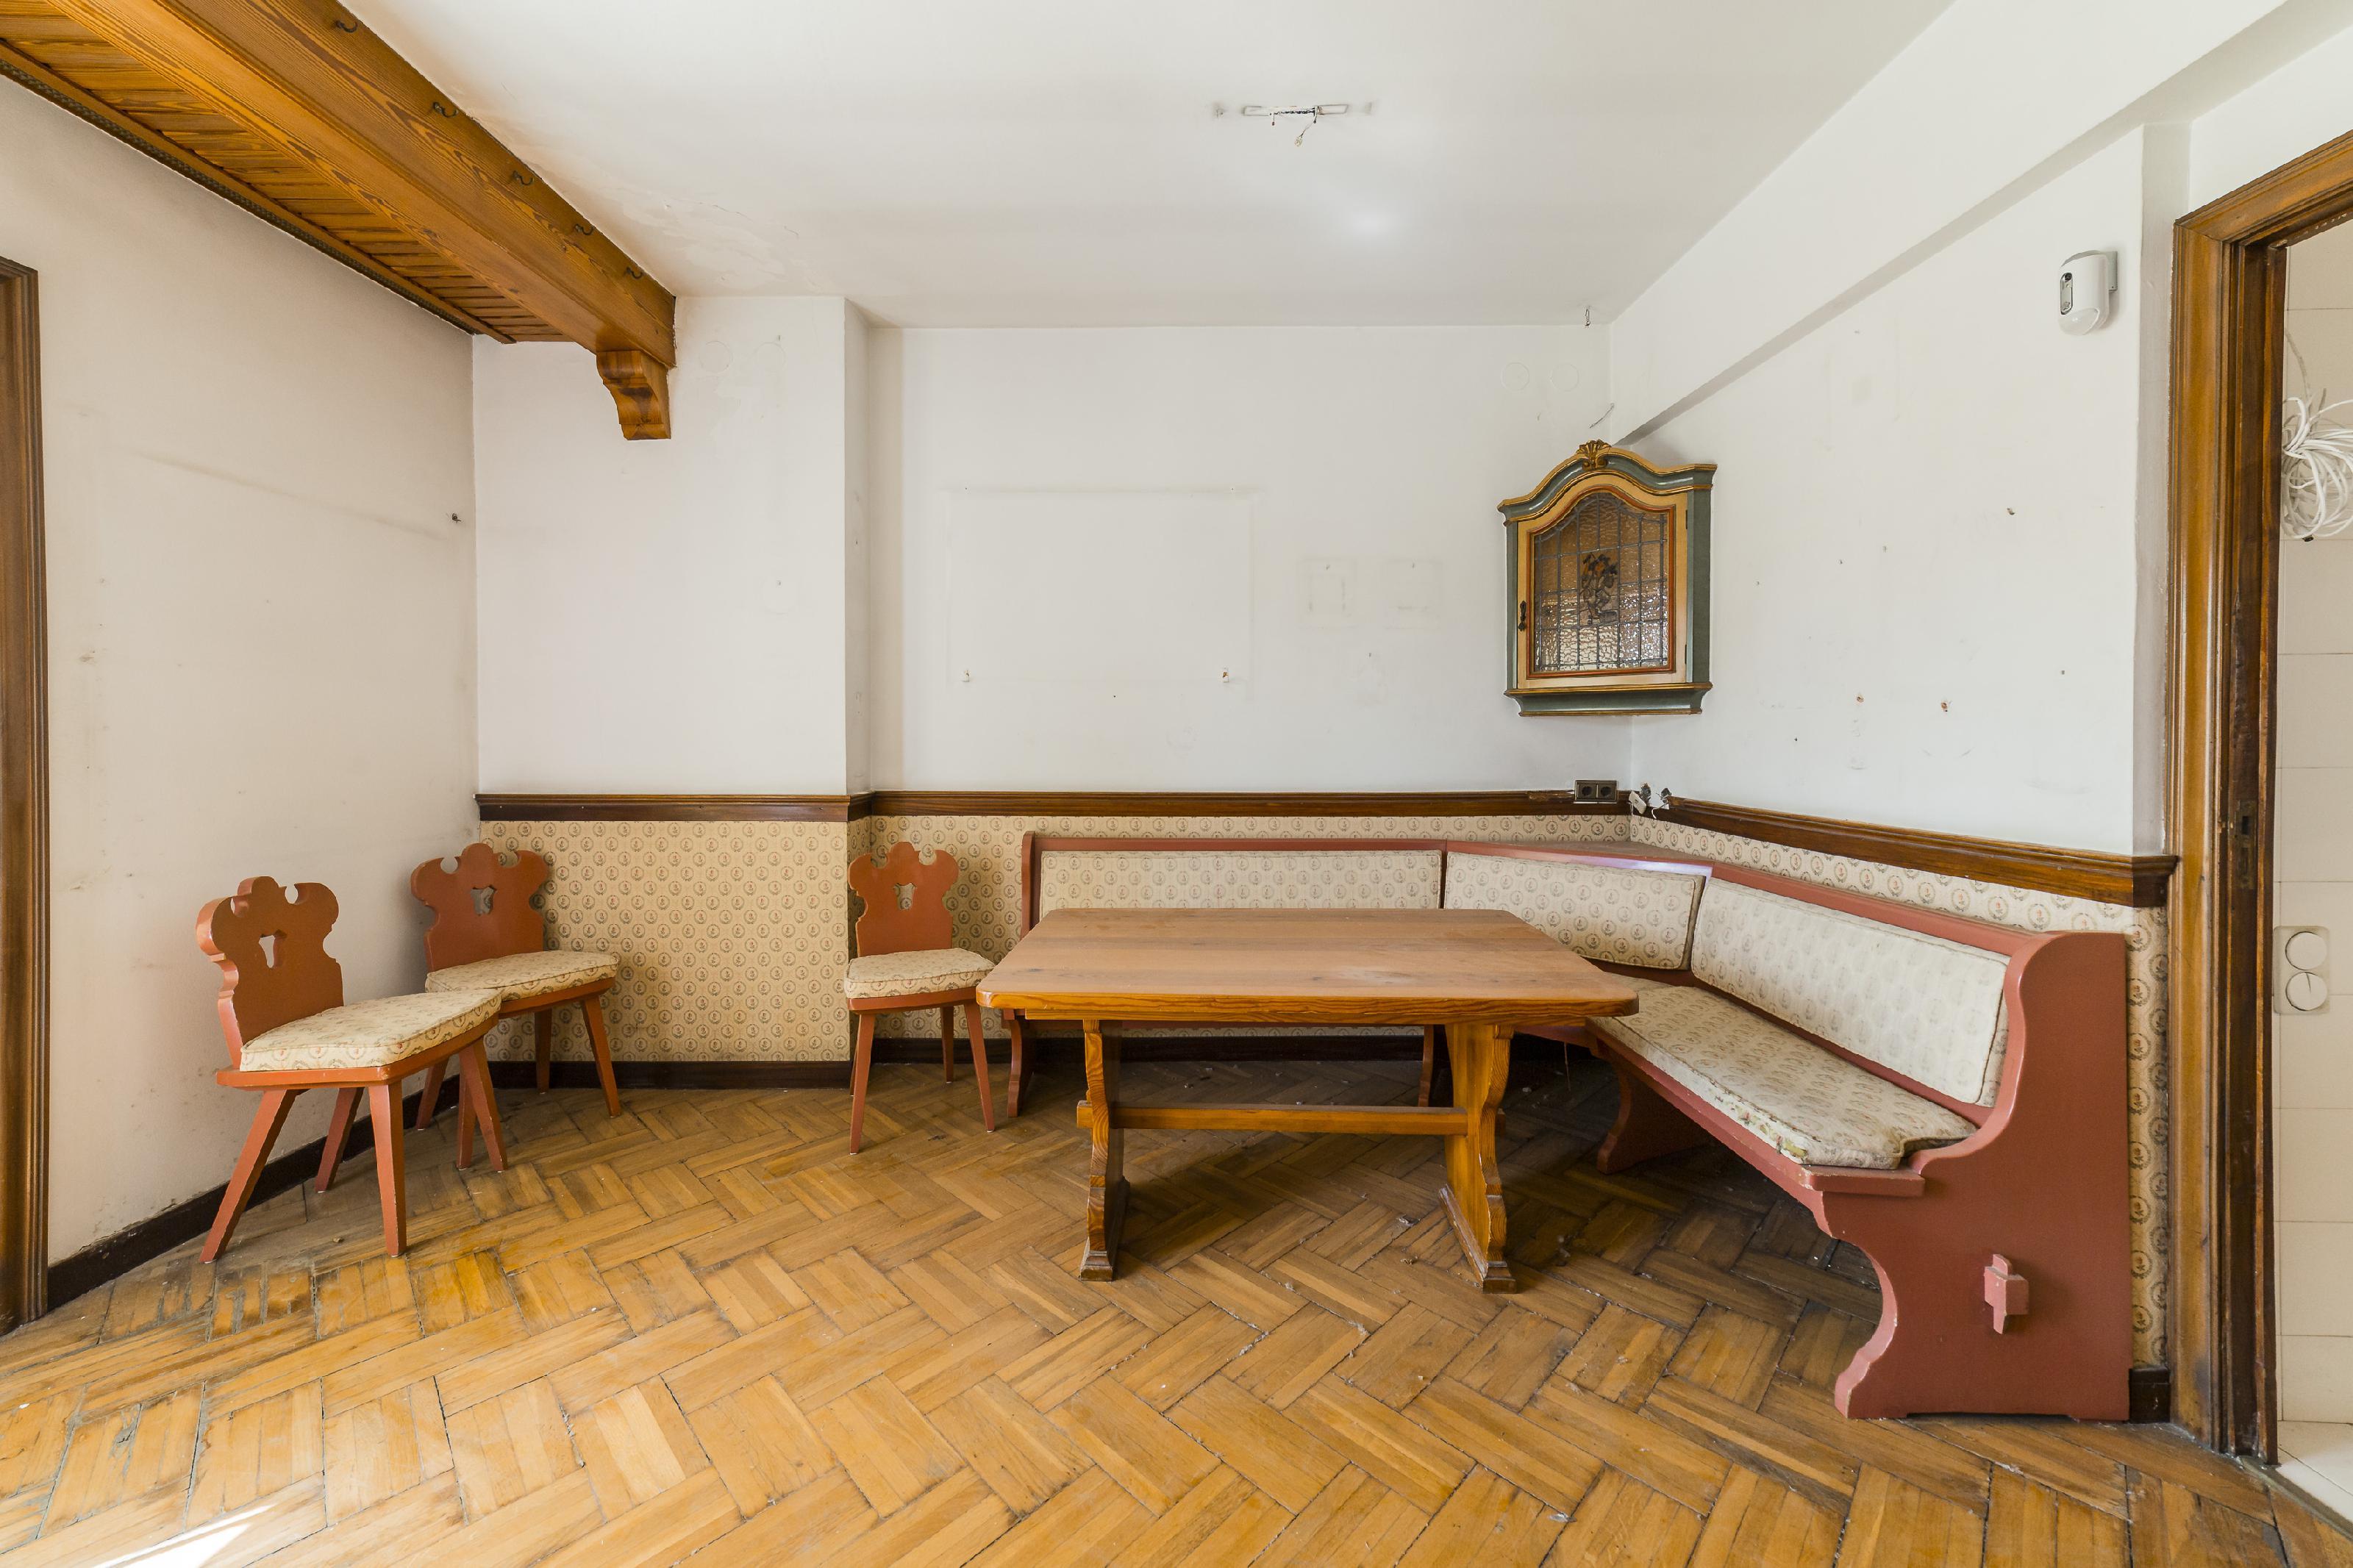 249314 Penthouse for sale in Sarrià-Sant Gervasi, Sant Gervasi-Galvany 12